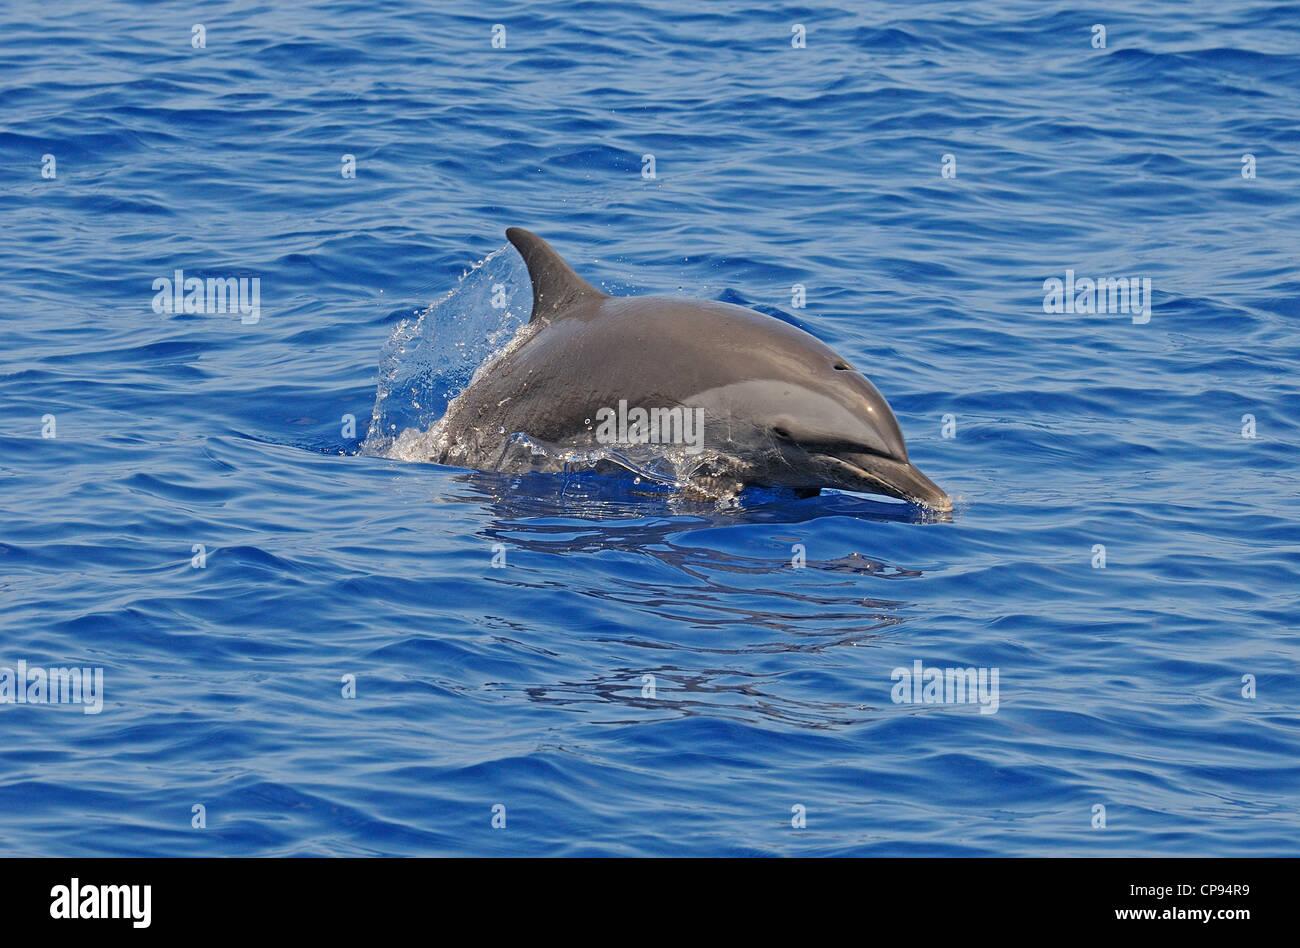 Pantropical Spotted Dolphin (Stenella attenuata) surfacing, The Maldives - Stock Image